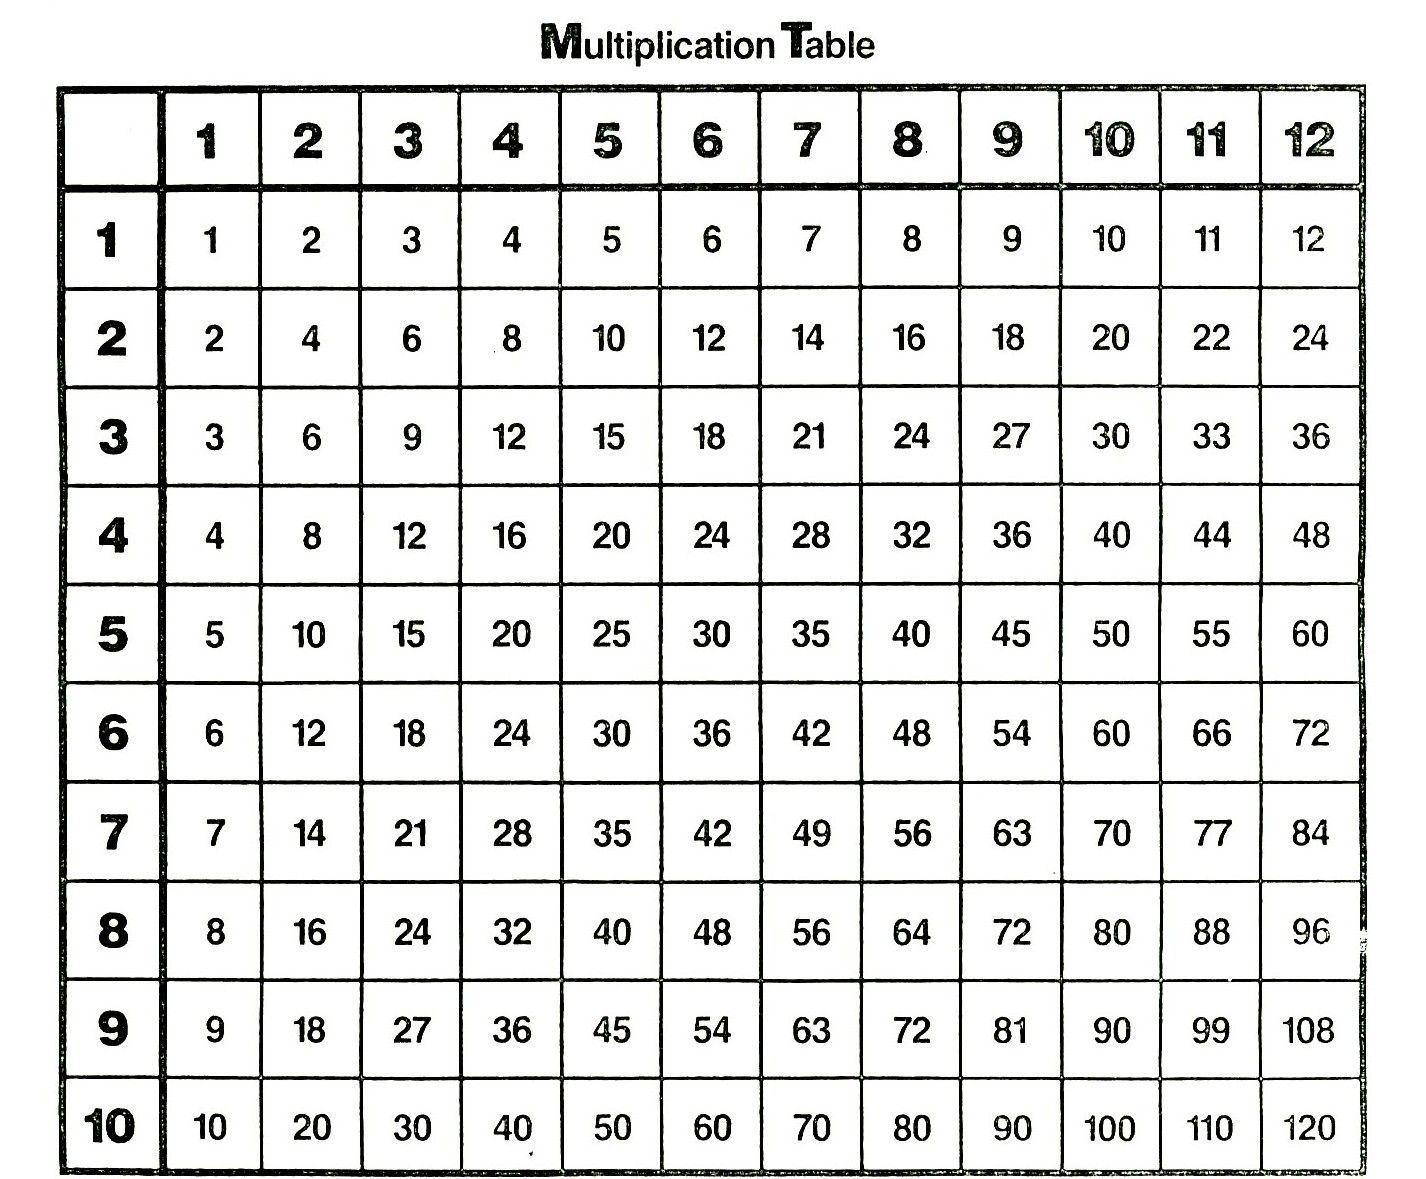 Multiplication Table Pdf Printable In 2020 | Multiplication